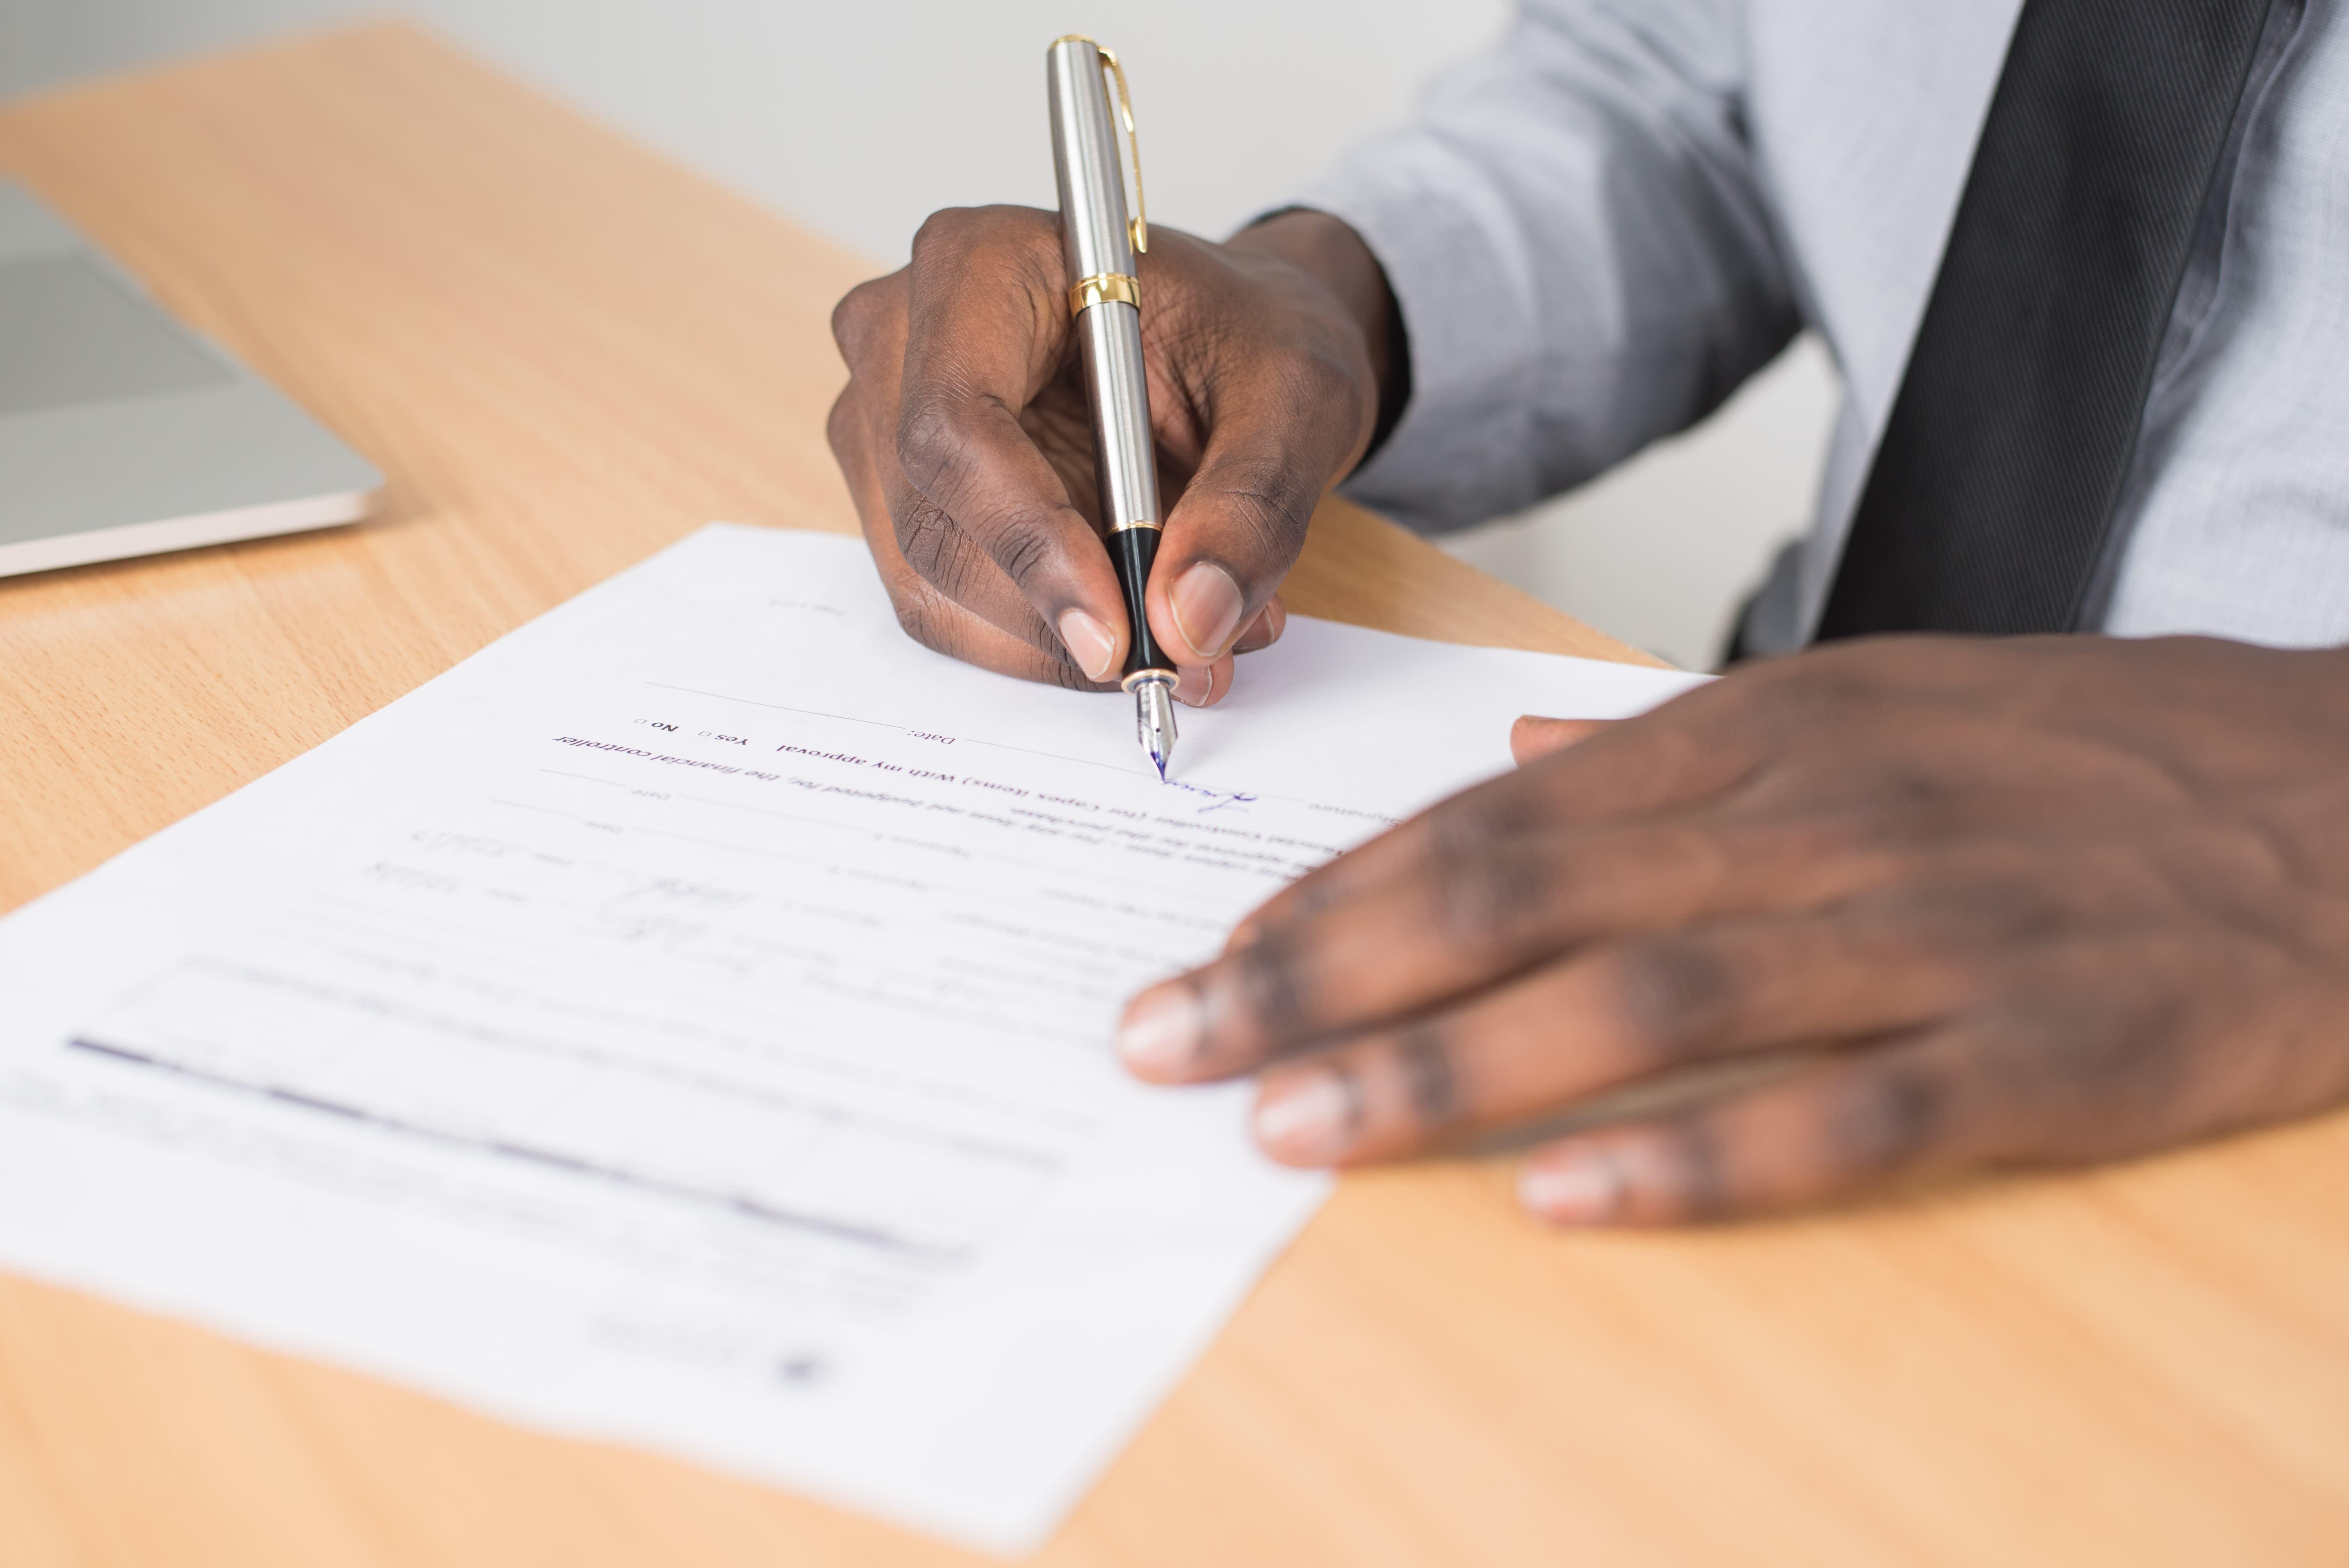 UK lenders foot bill for EWS1 forms